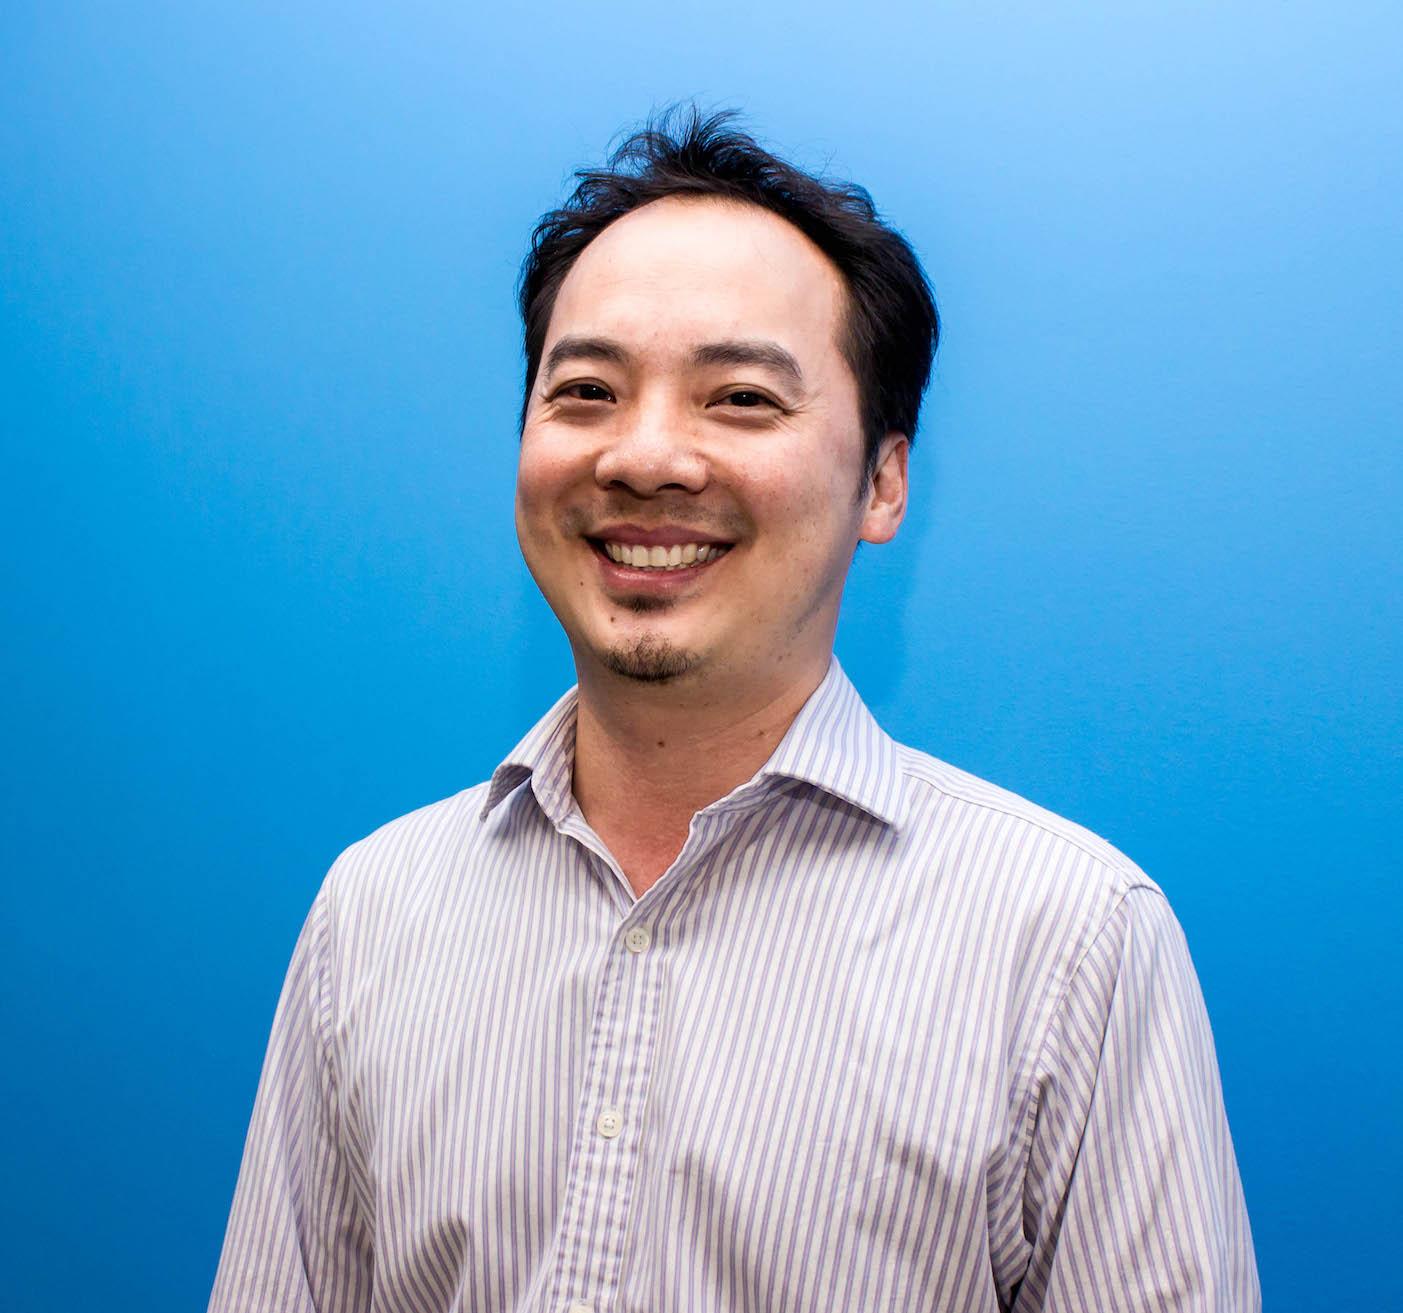 Chieu Cao, founder of Perkbox